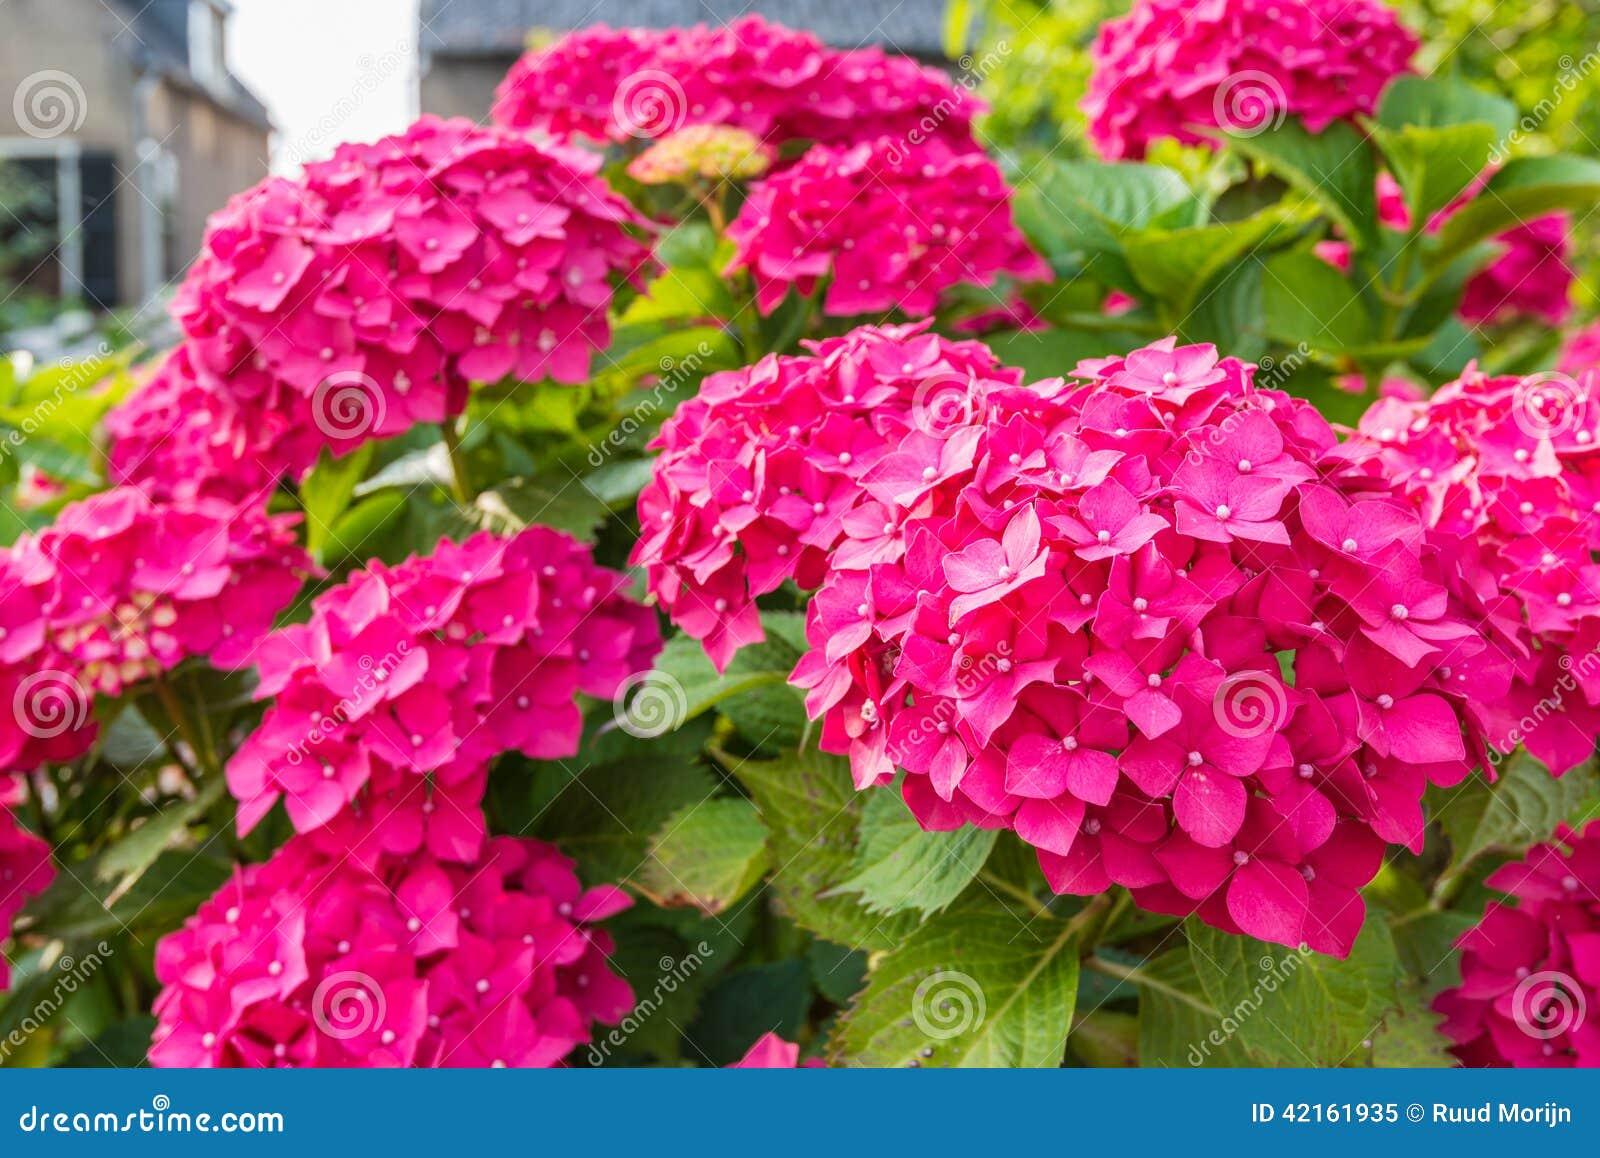 Closeup Of A Dark Pink Blooming Hydrangea Shrub Stock